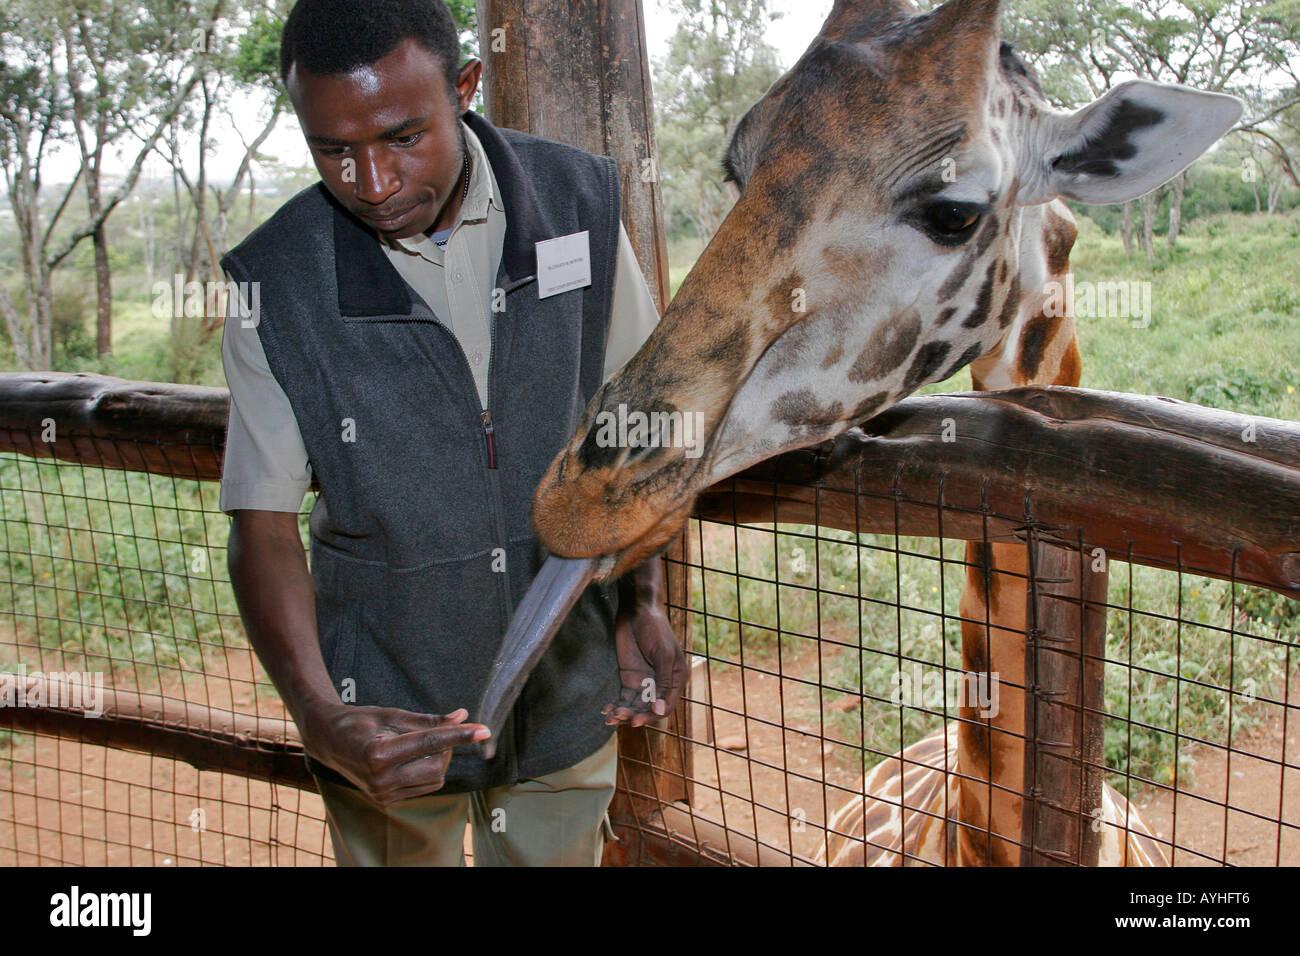 Visitor feeds giraffe with long blue tongue at refuge near Nairobi Kenya Africa Stock Photo